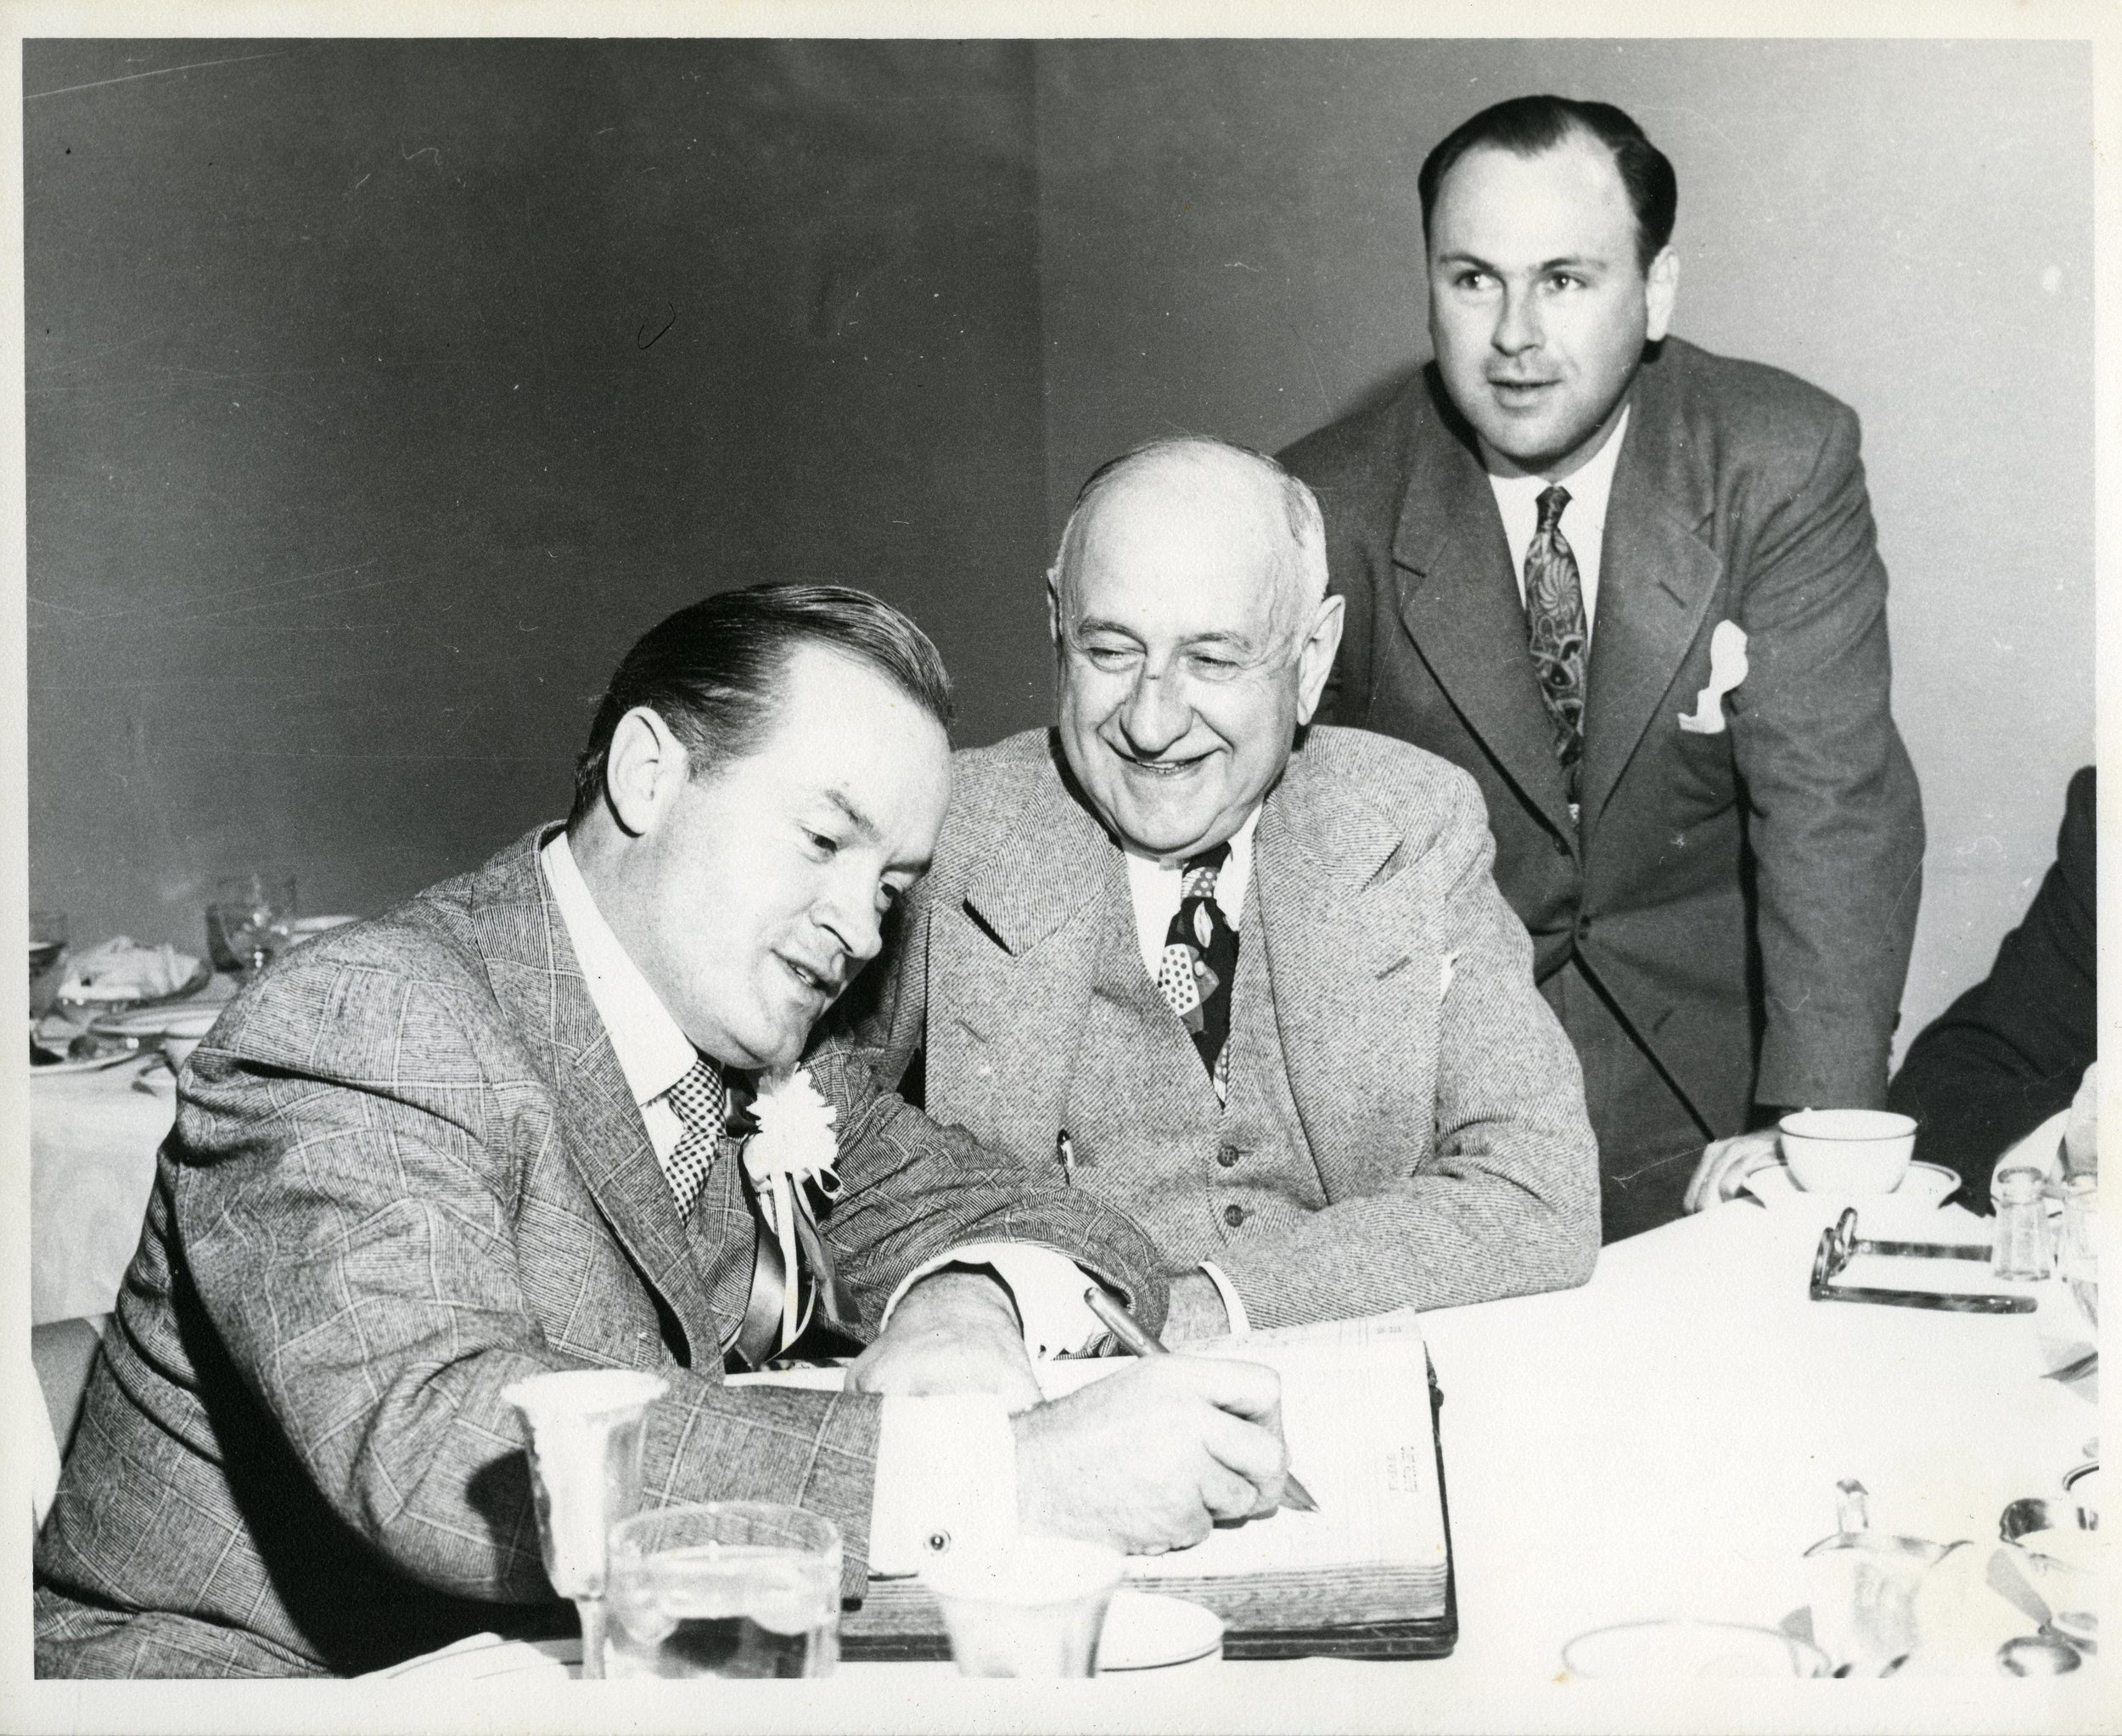 Hope_Bob_Luncheon_Fort_Worth_1949_012.jpg